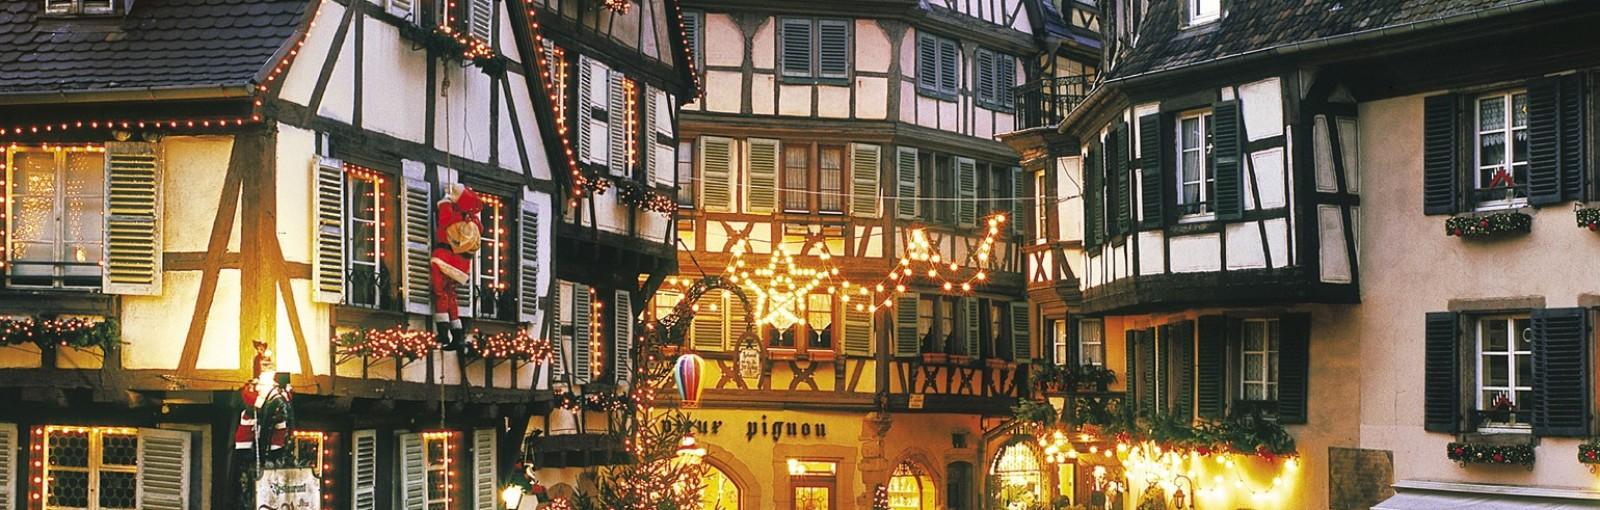 Tours Overnight tour in Alsace - ALSACE - Regional tours